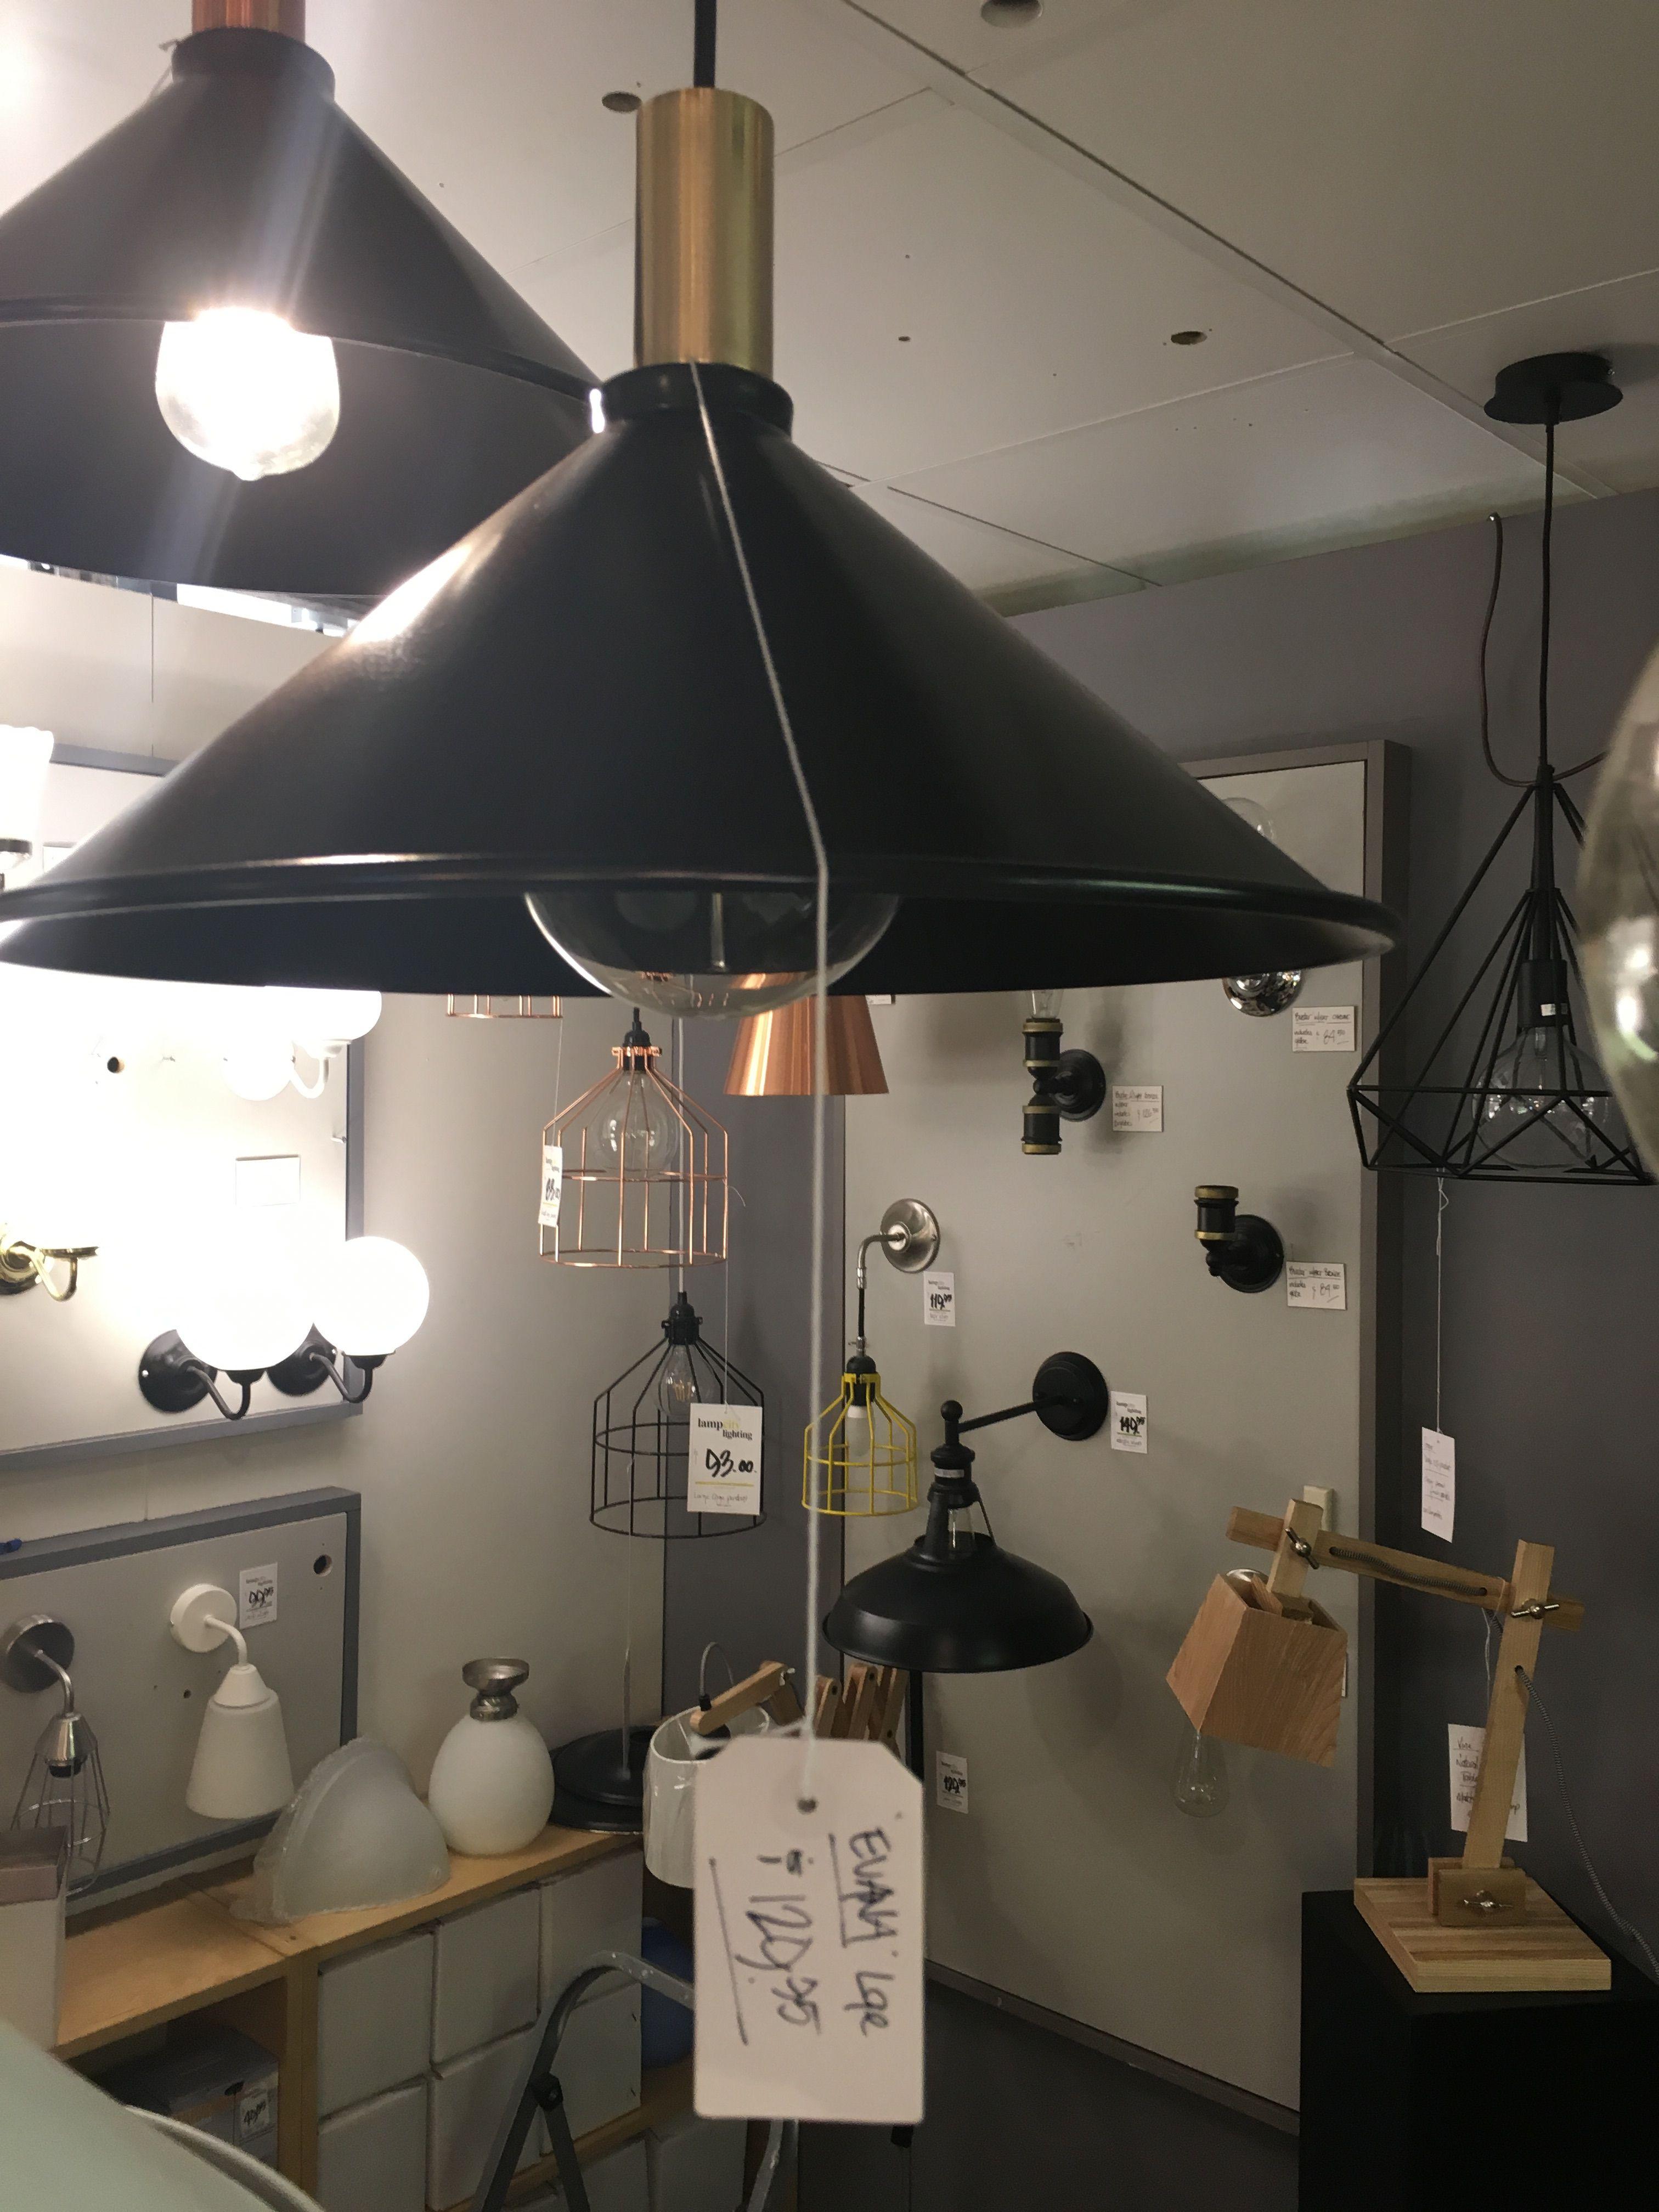 Lamp City Lighting Ascot Vale Potential Study Light Home